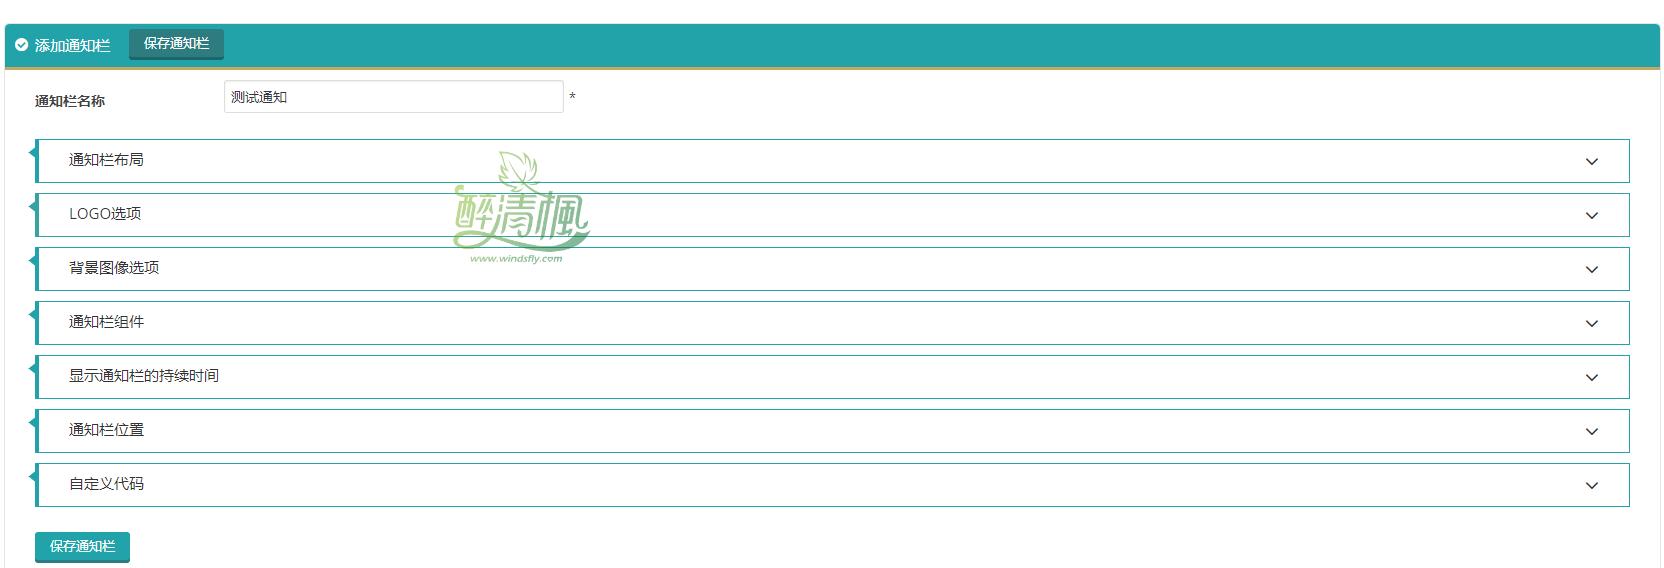 WordPress高级通知插件 - Apex Notification Bar(汉化)[更新至v2.1.4] WordPress插件 第2张